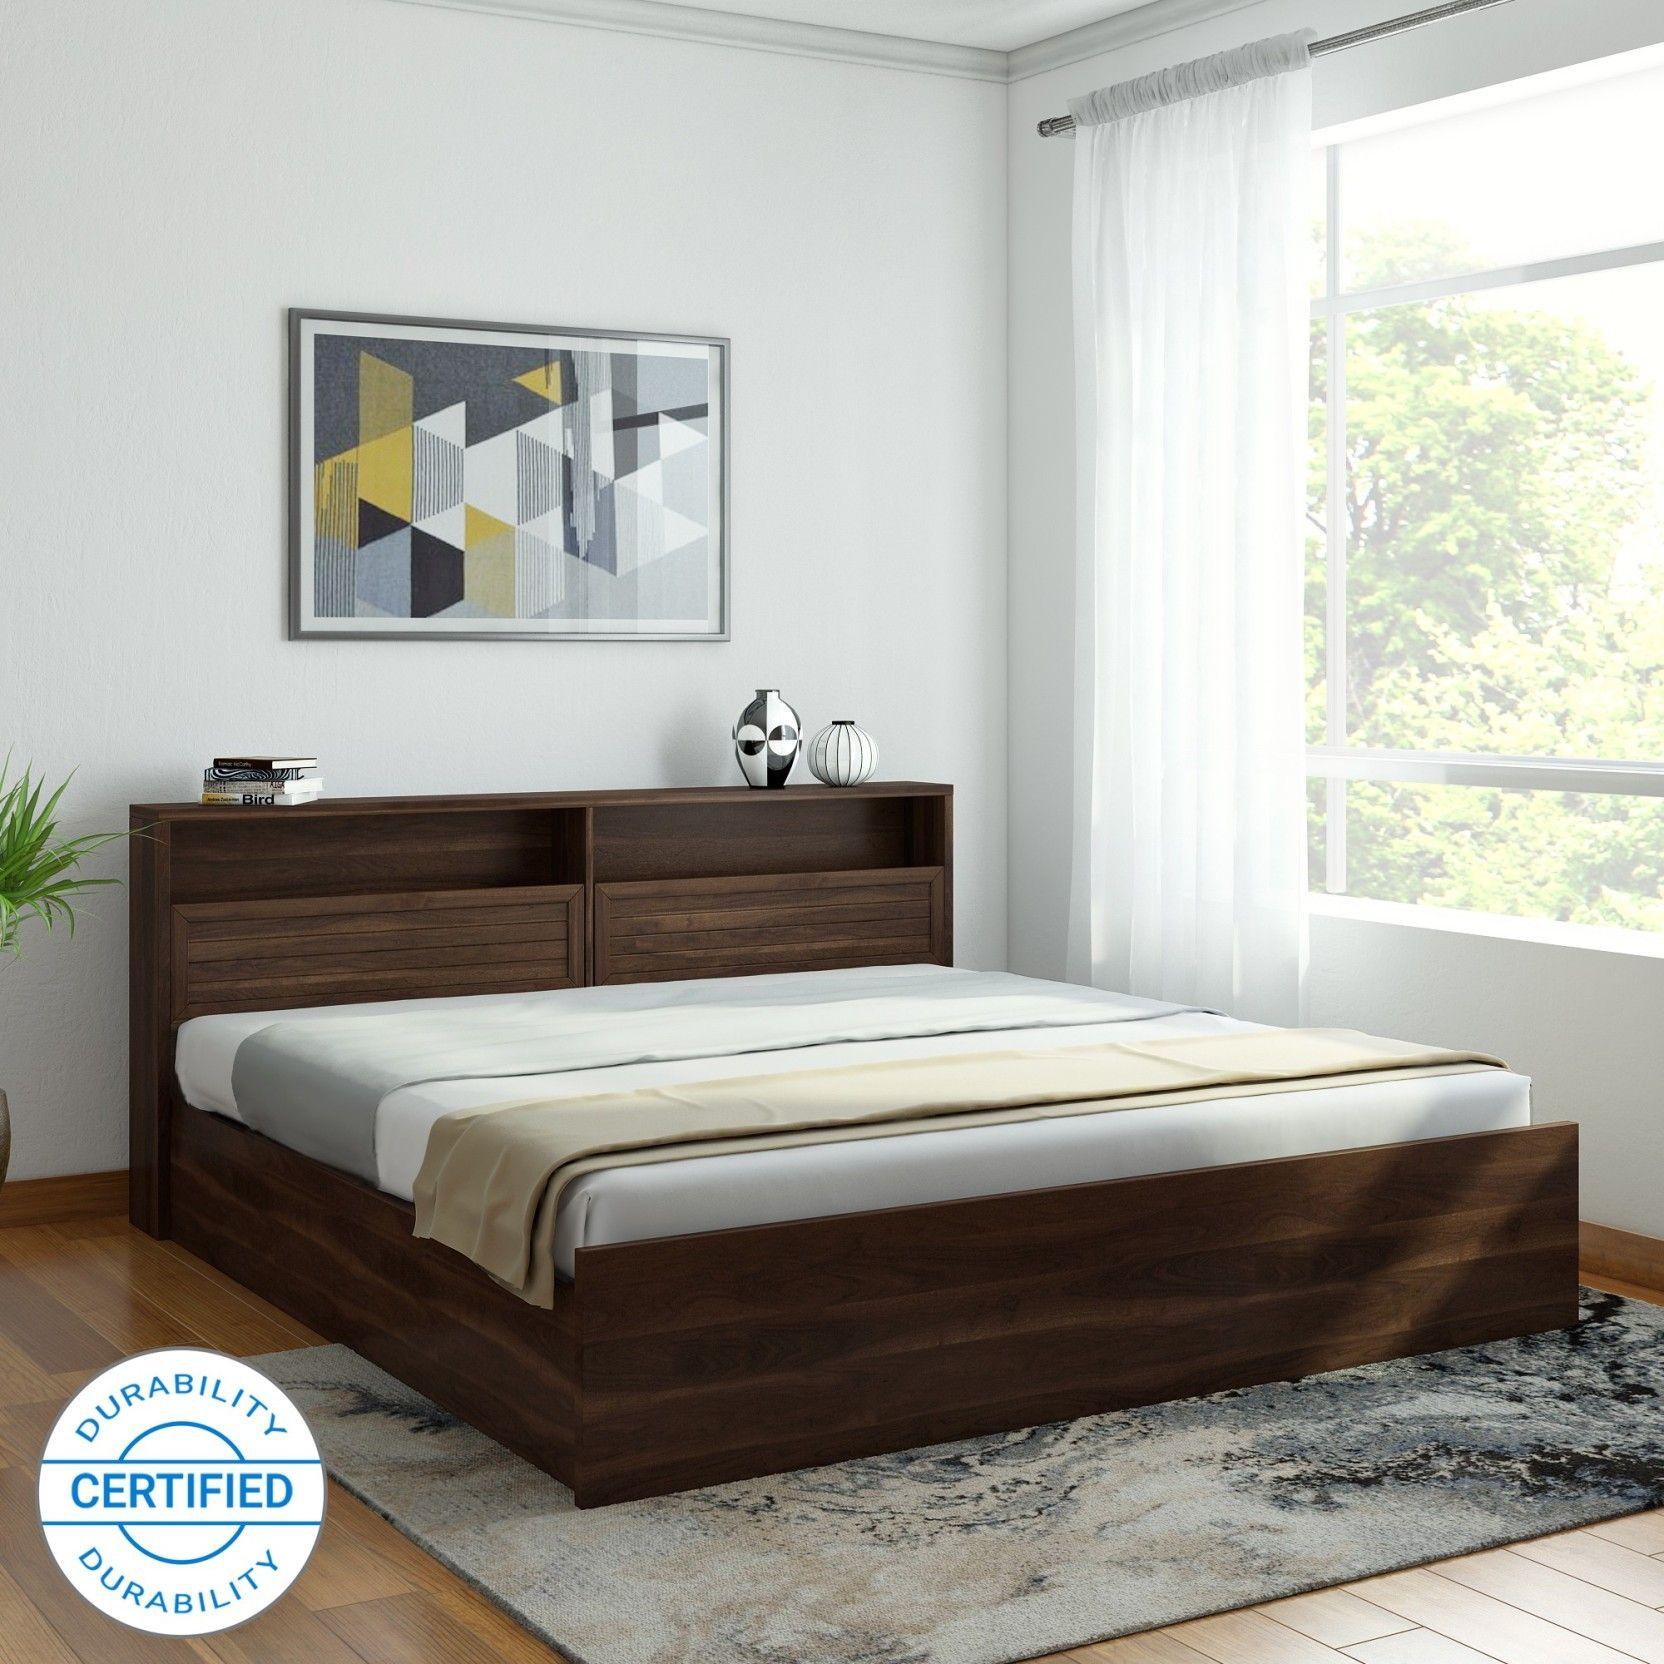 Hometown Alyssa Engineered Wood King Box Bed Price In India Buy Hometown Alyssa Engineered Wood King Box Bed Online At Flip Box Bed Bed Price Engineered Wood